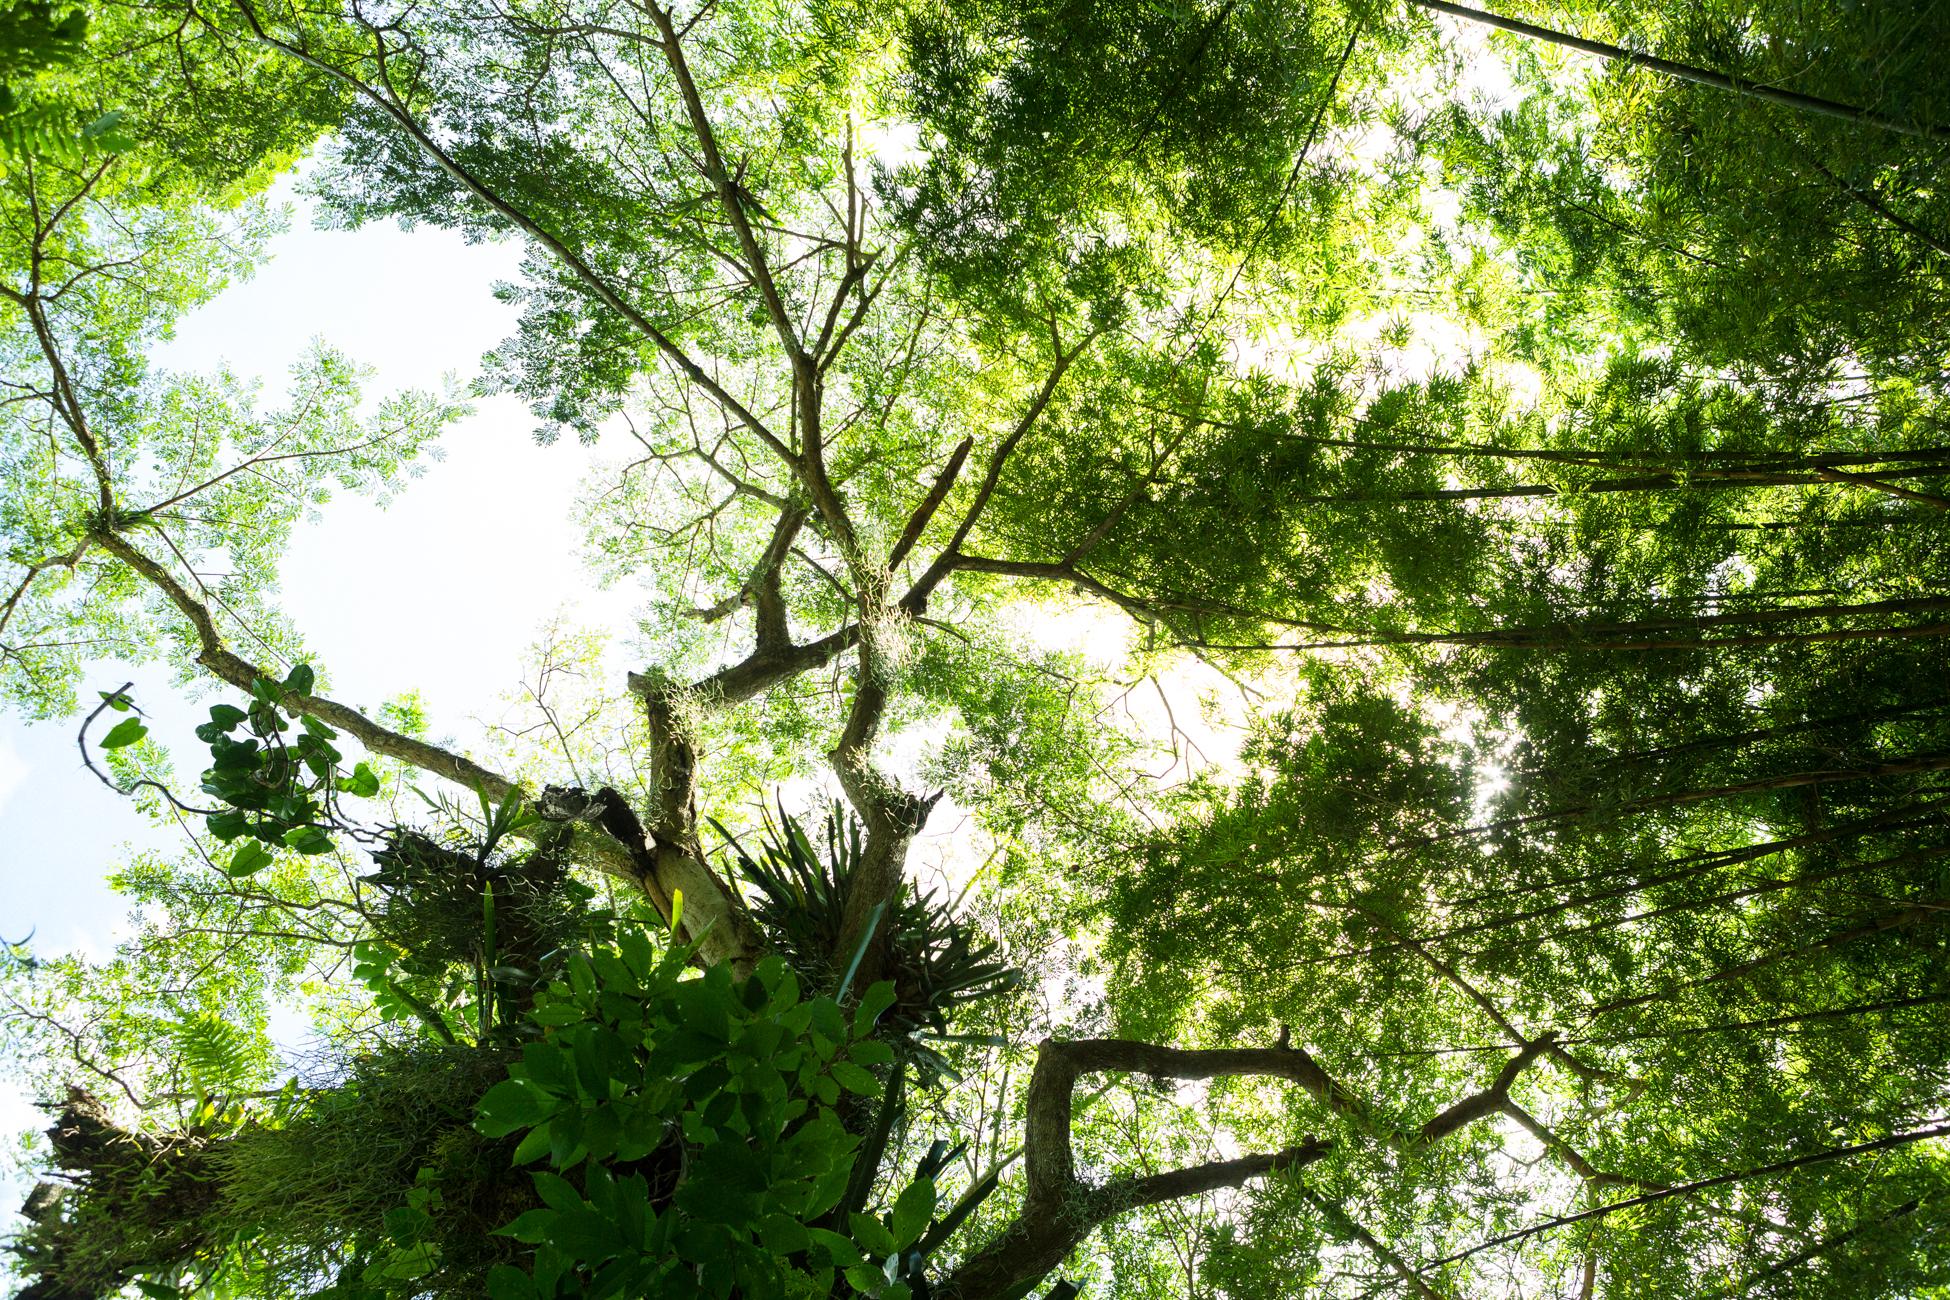 Jungle IV, 2013 //  80 cm x 120 cm